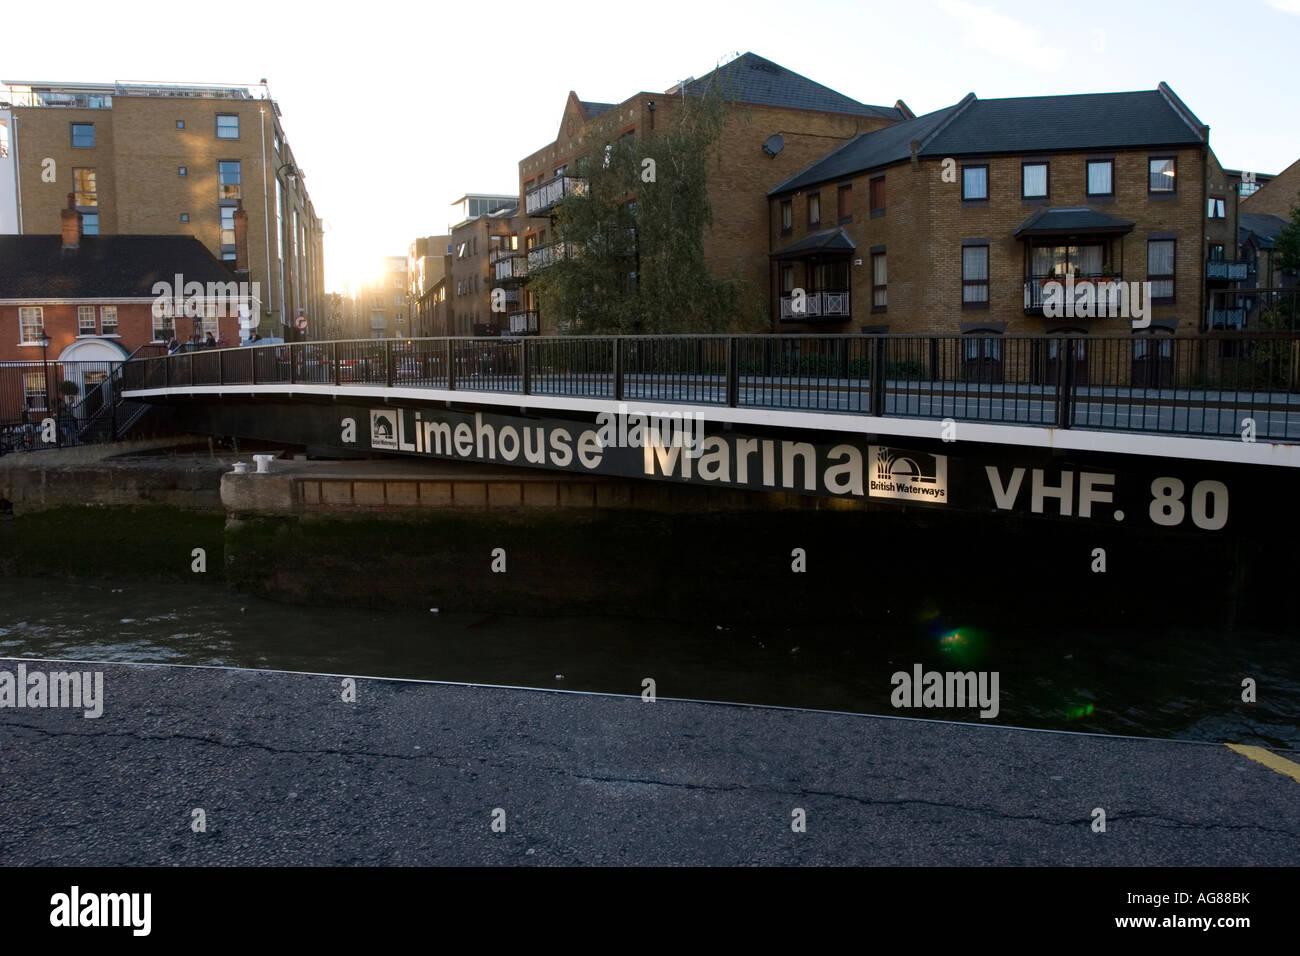 Swing Bridge Limehouse marina london - Stock Image